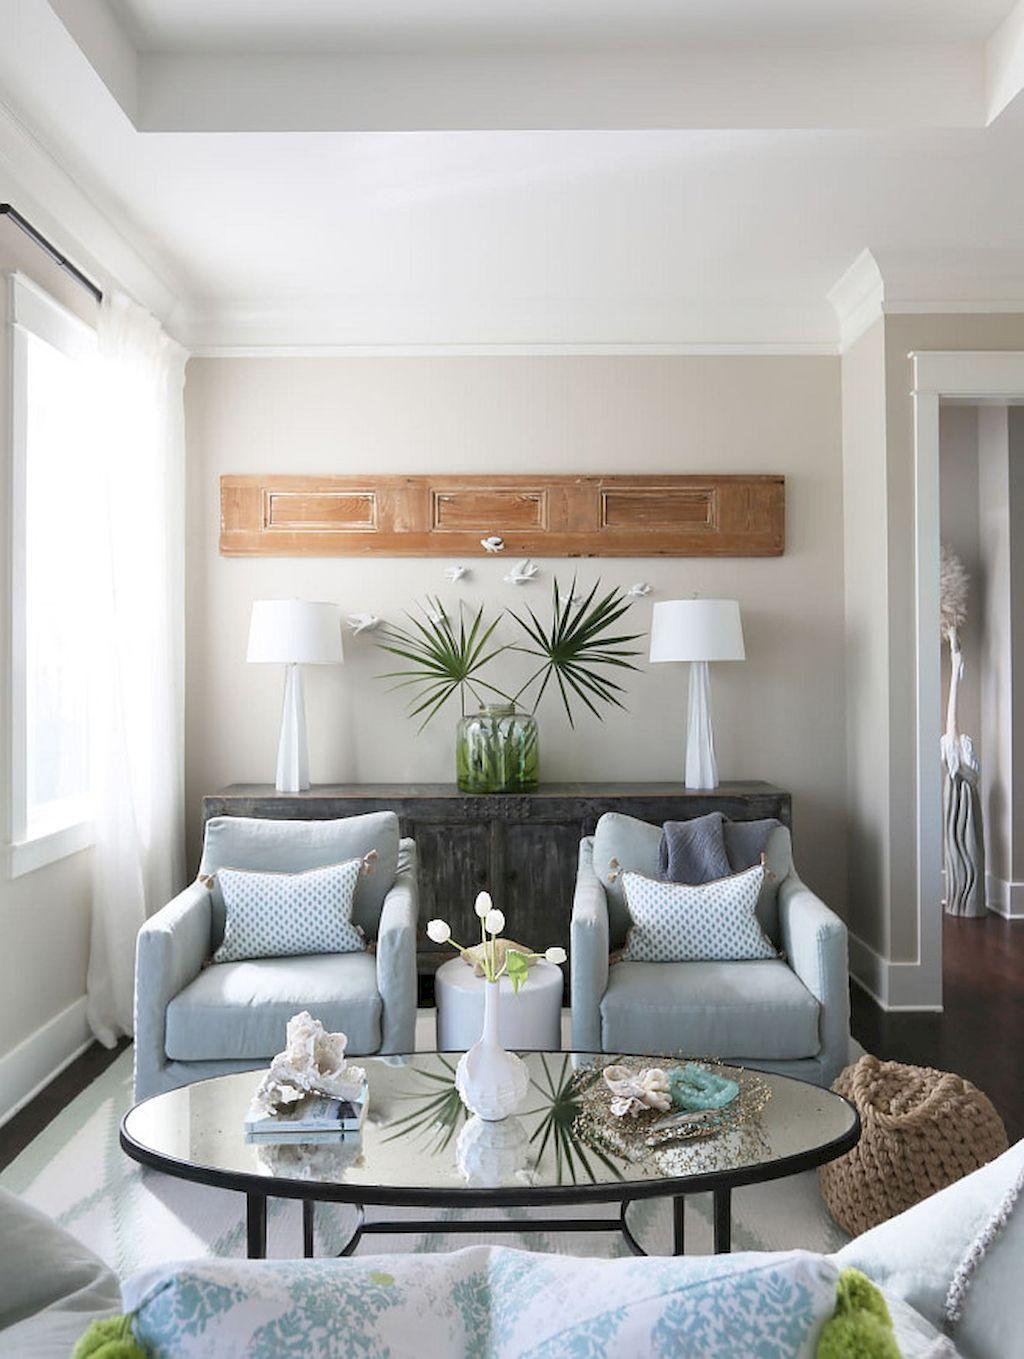 99 Cozy And Stylish Coastal Living Room Decor Ideas  Coastal Amusing Coastal Living Room Designs Decorating Design